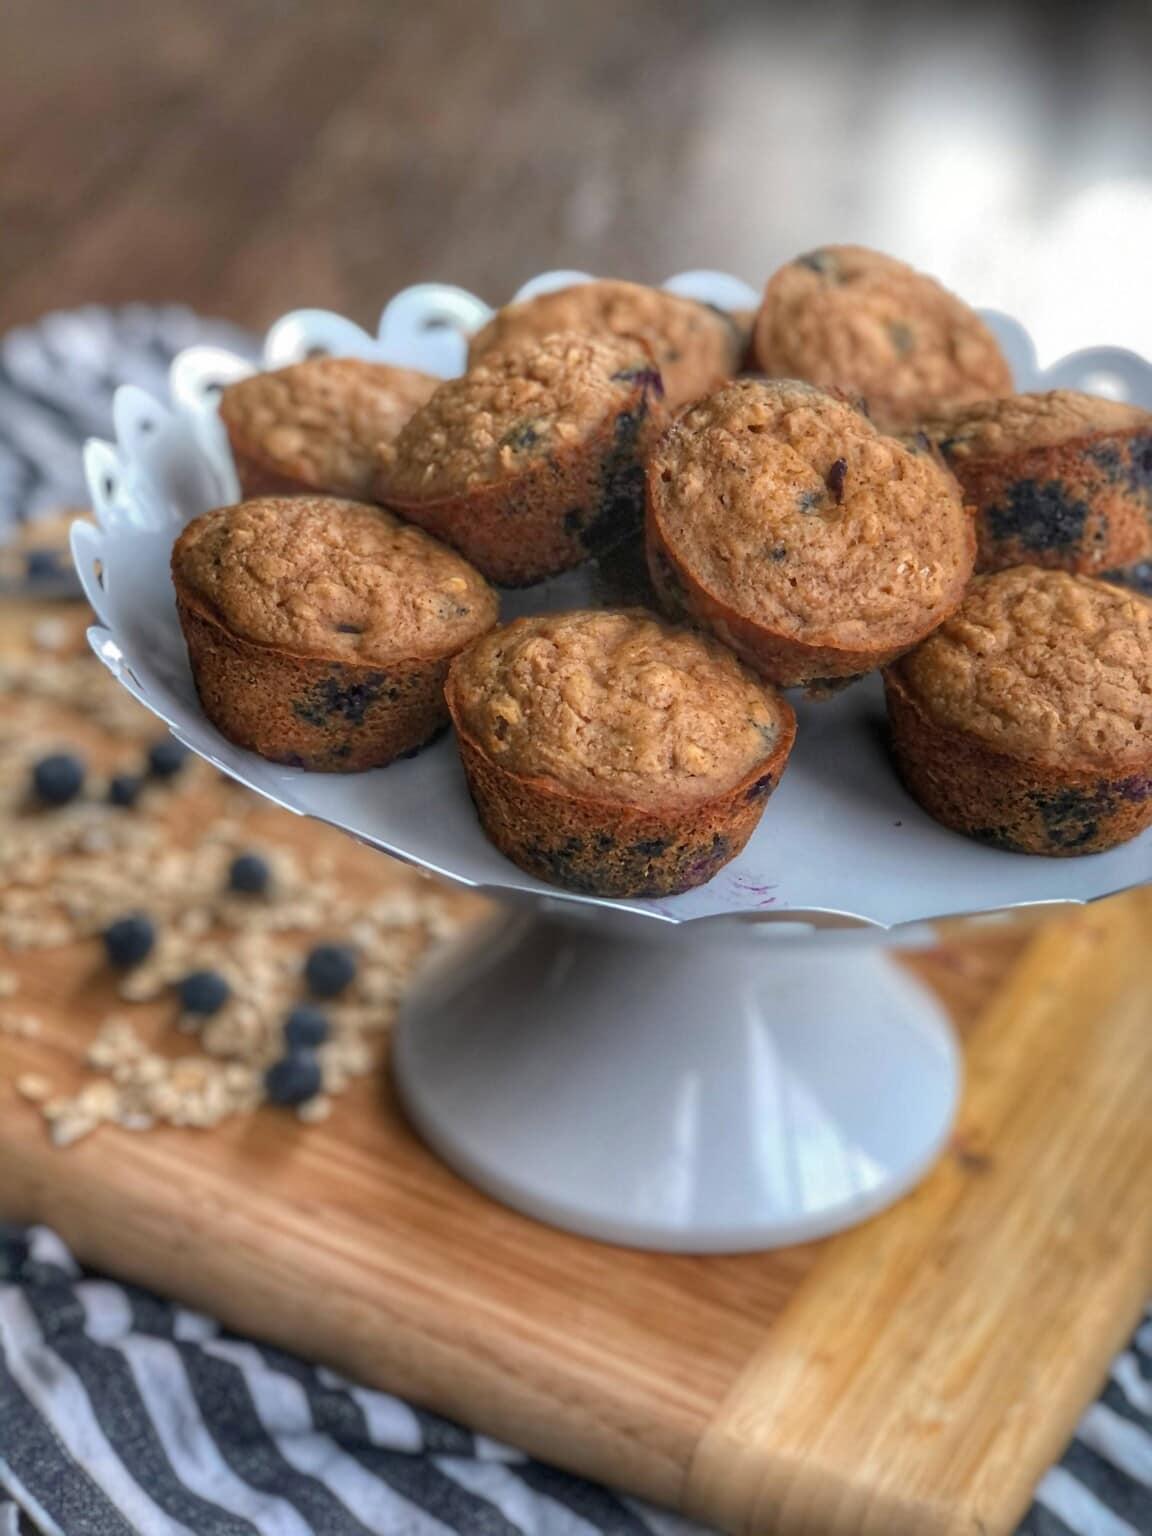 blueberry-muffins-6-1152x1536